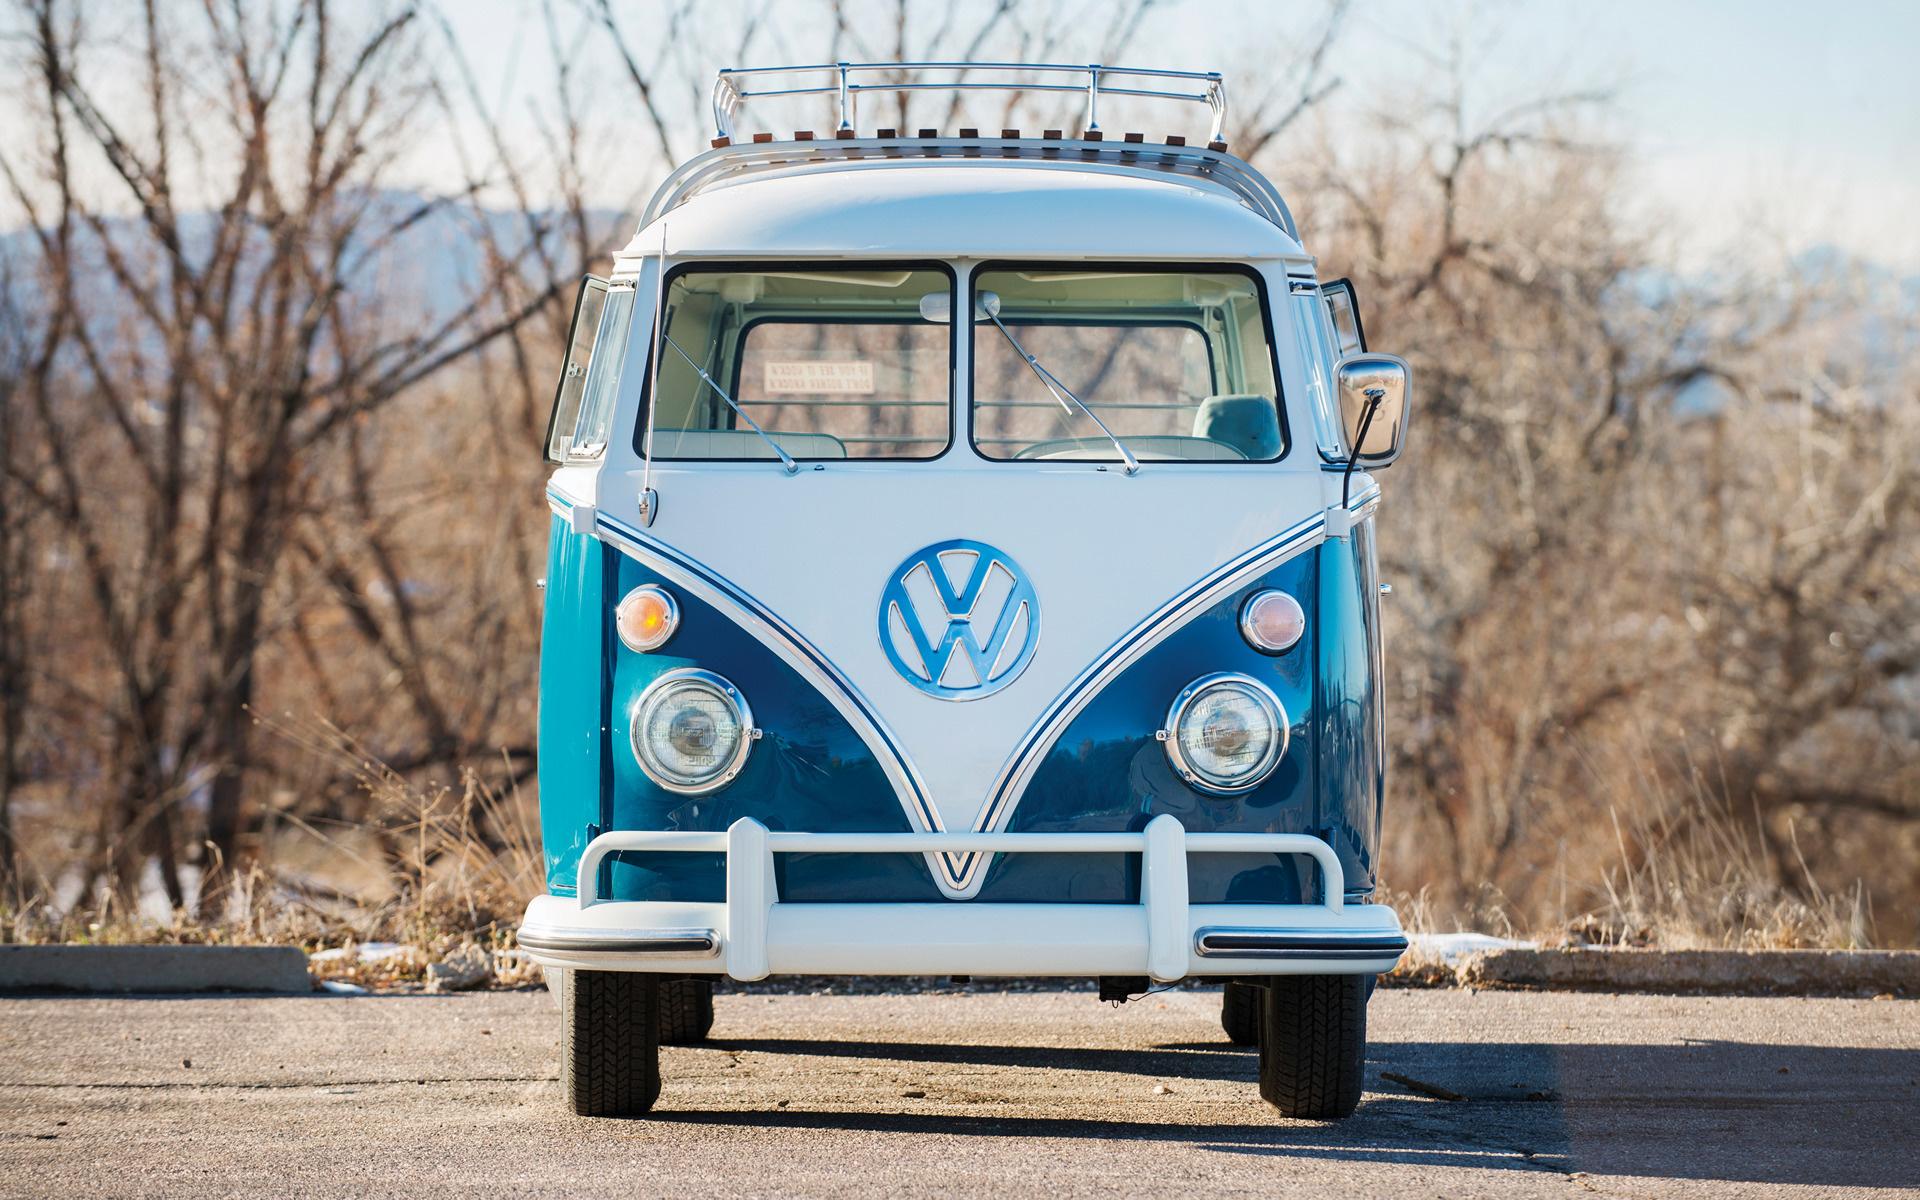 Volkswagen T1 Deluxe Microbus (1967) US Wallpapers and HD ...